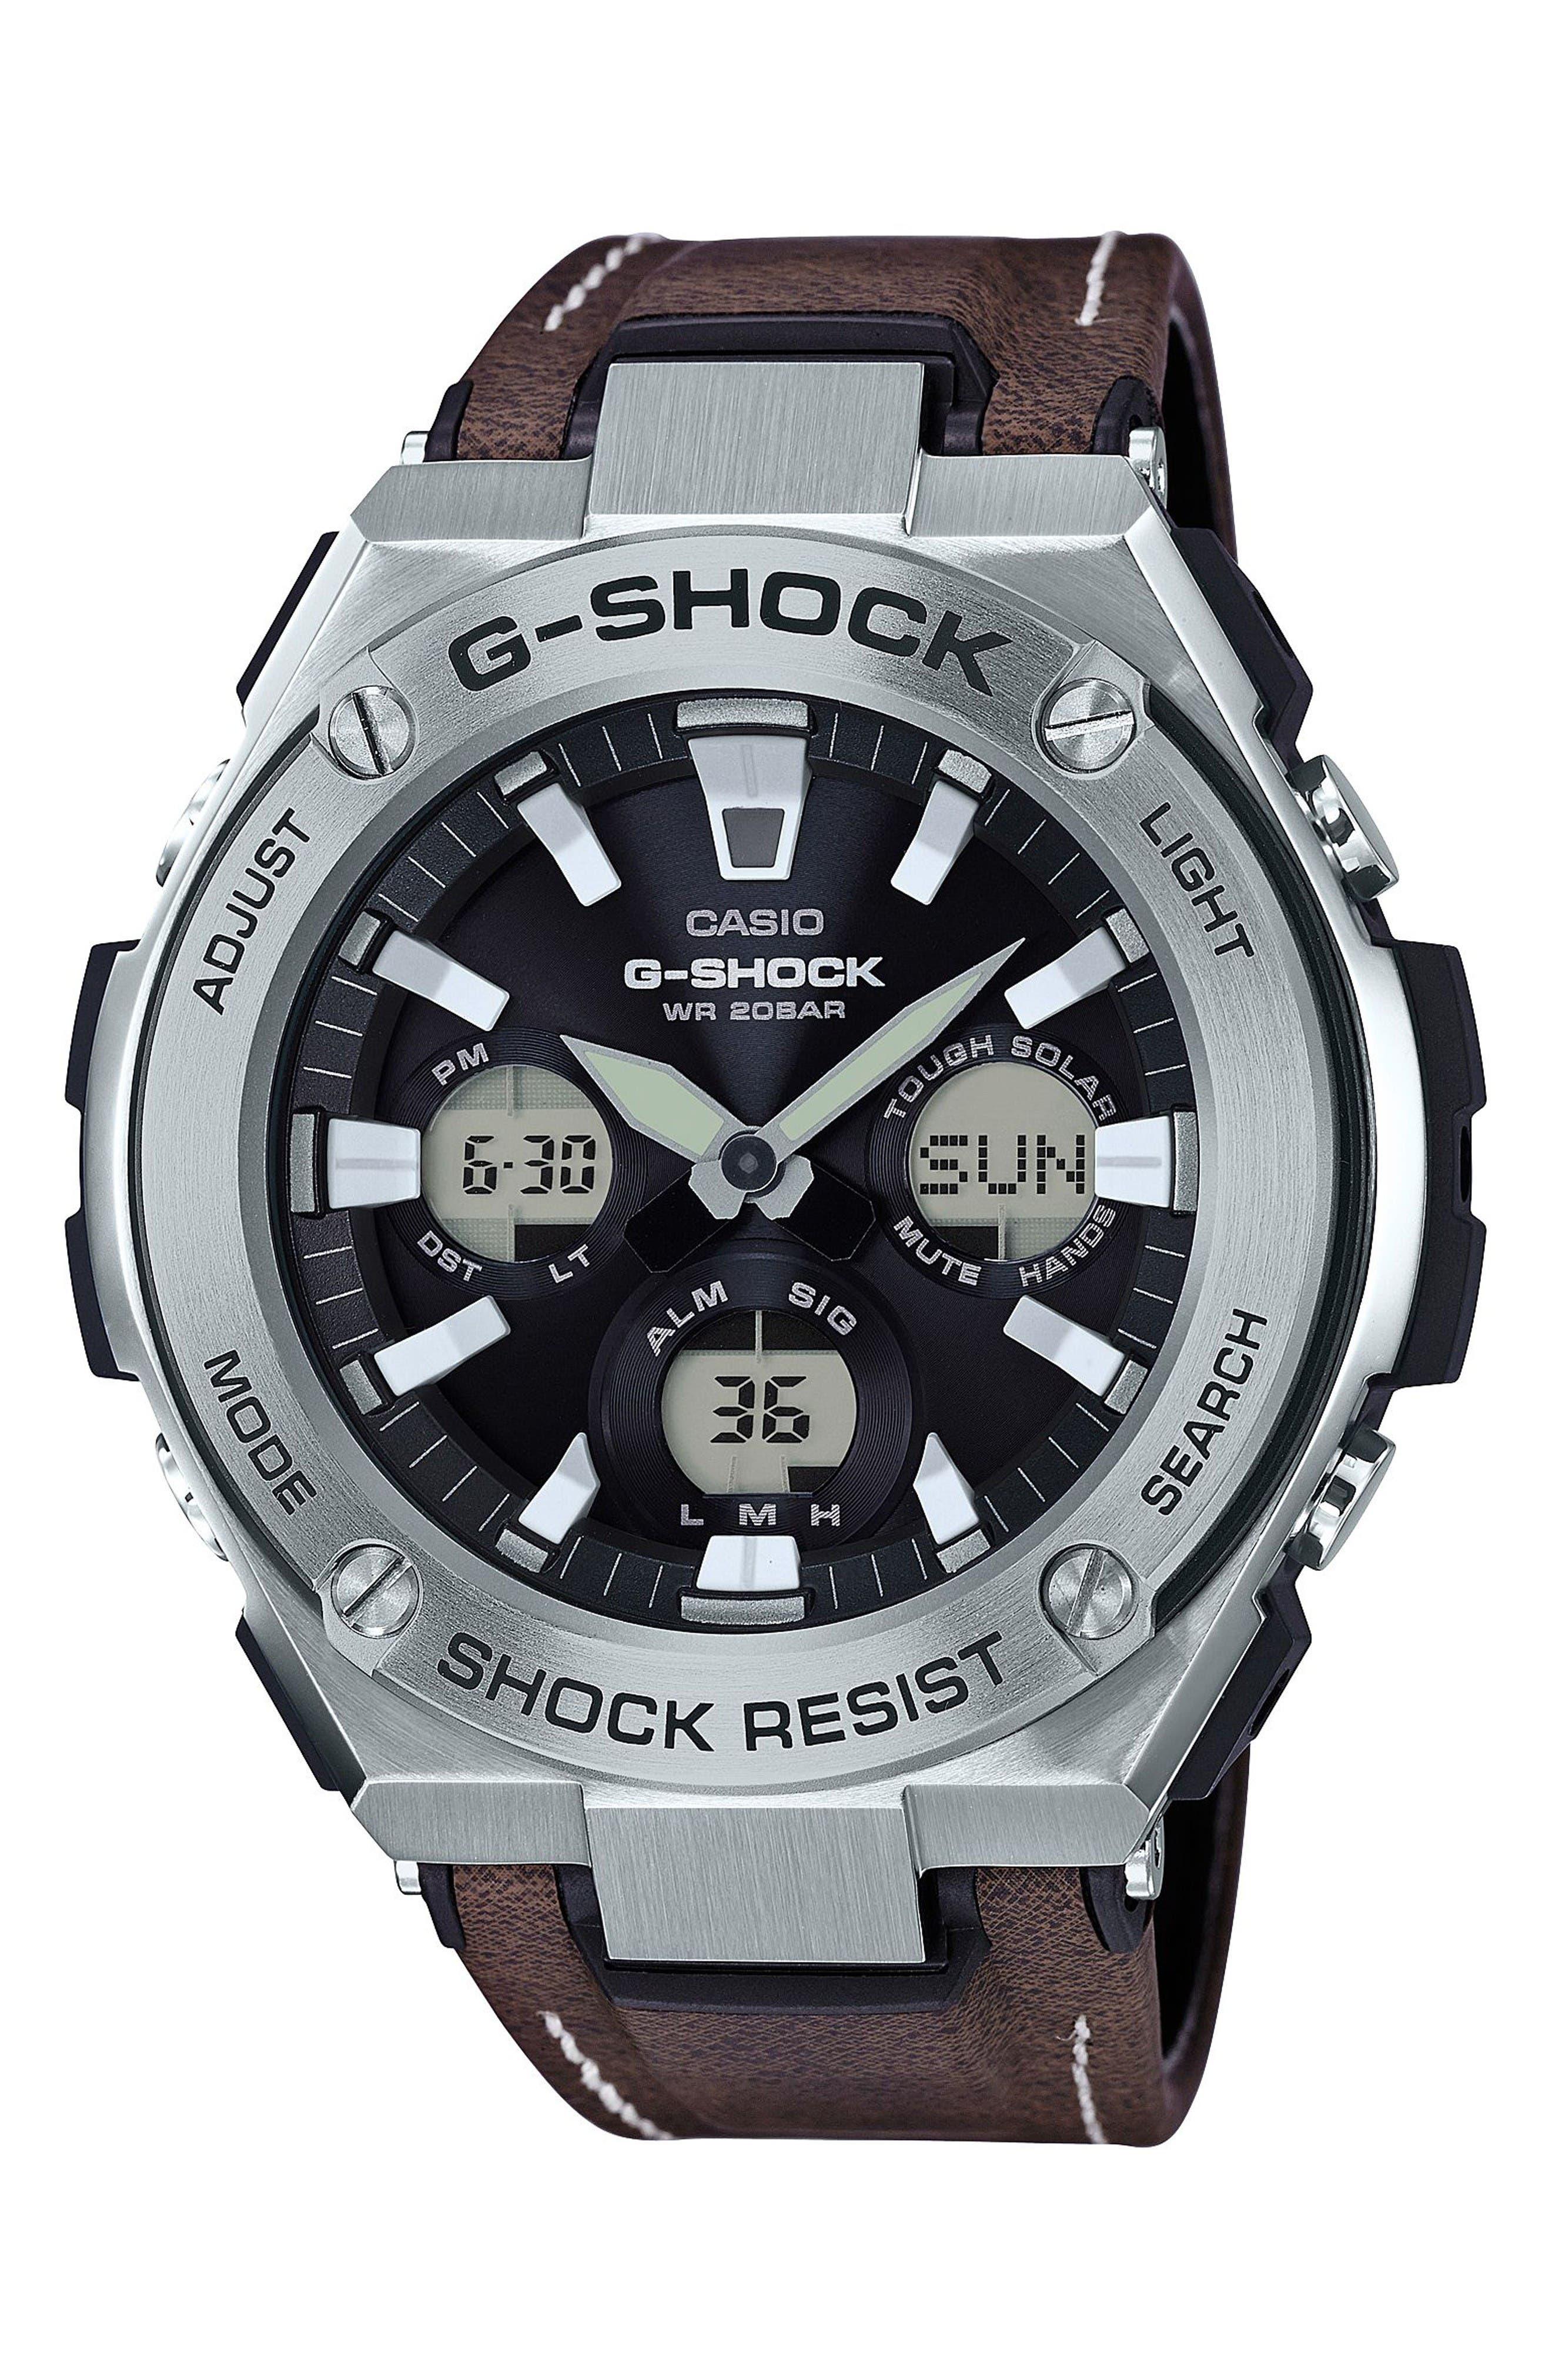 G-SHOCK BABY-G G-Shock G-Steel Solar Leather Strap Watch, 59mm